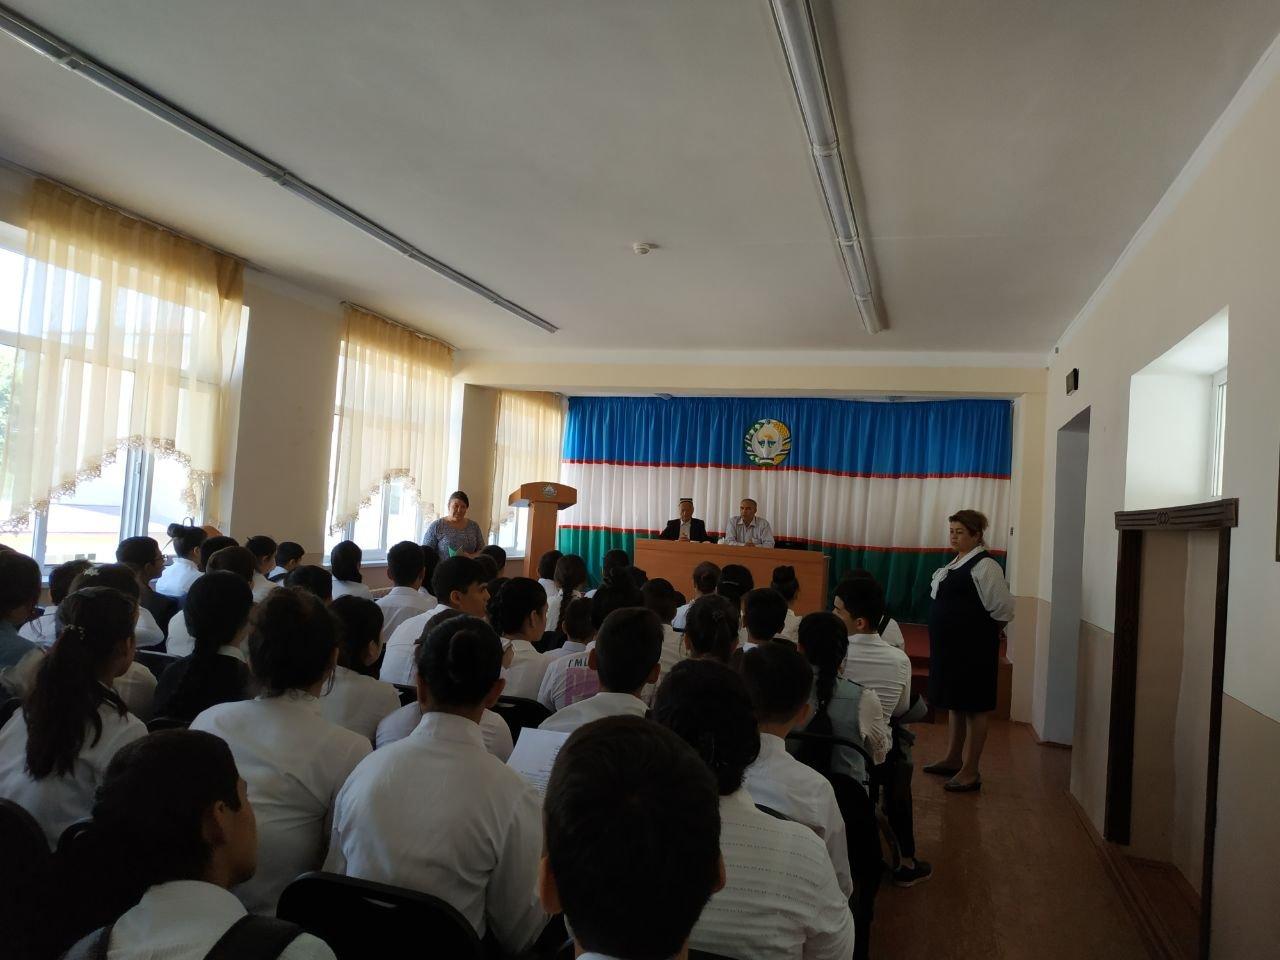 Фото 246202659_410819.jpg. Узбекистан, Toshkent Viloyati, Тошкент, Shirin ko